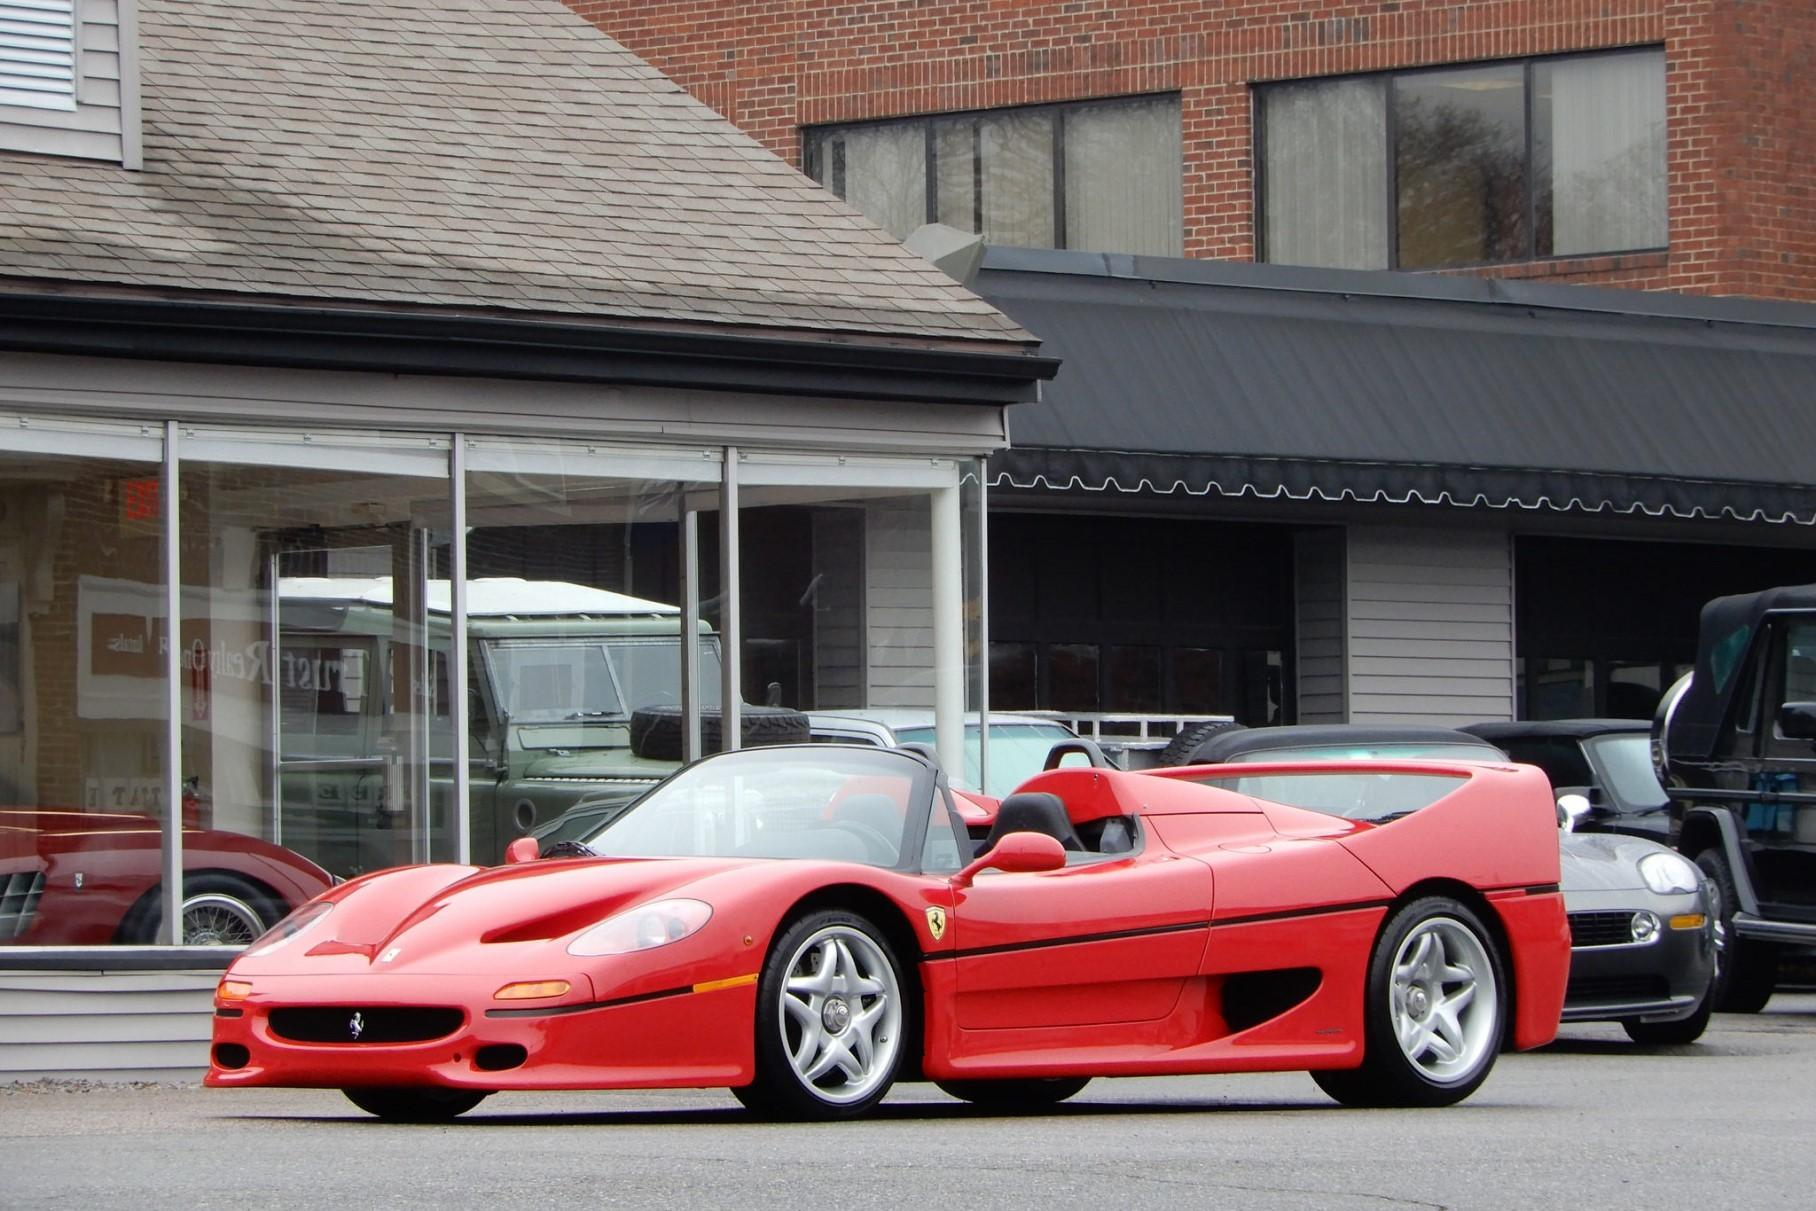 Культовый суперкар Ferrari продадут по цене шести Rolls-Royce